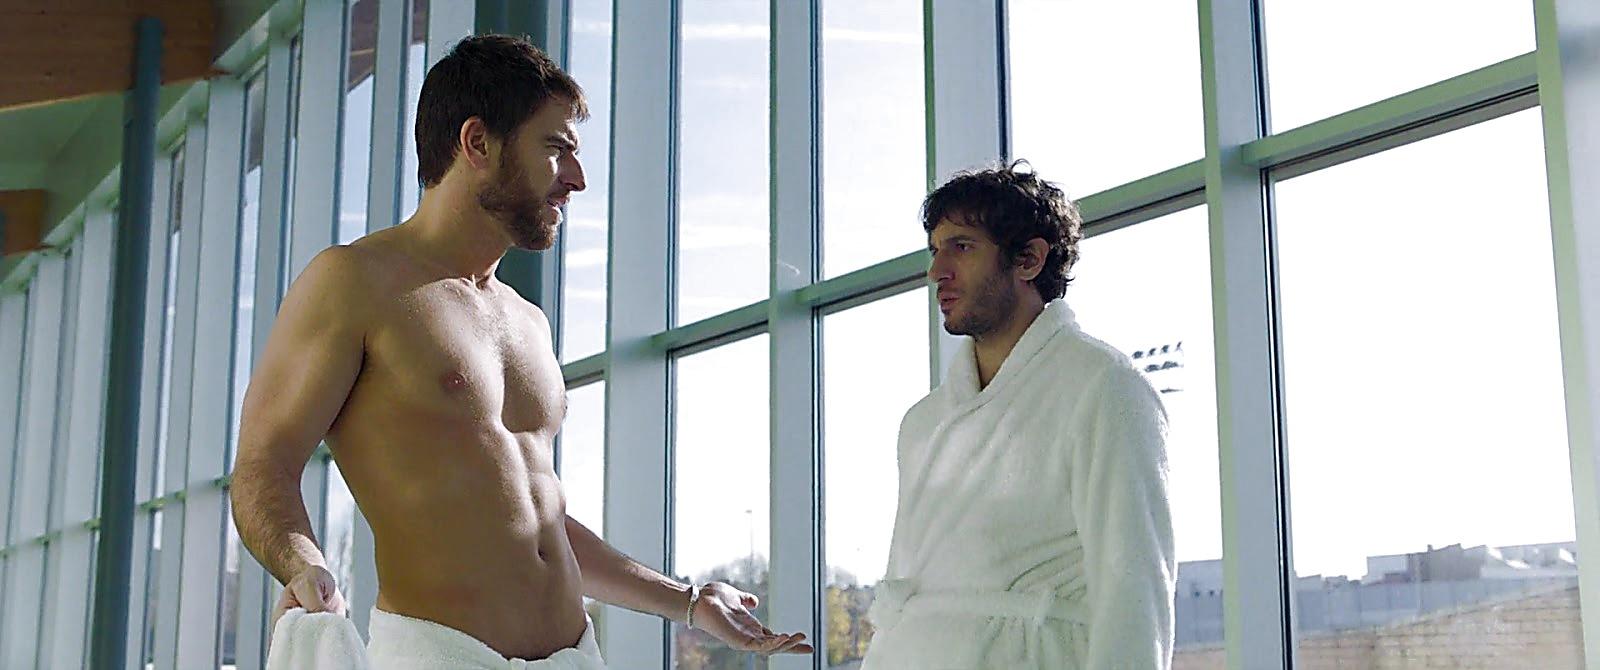 Alfonso Bassave sexy shirtless scene May 18, 2020, 6am